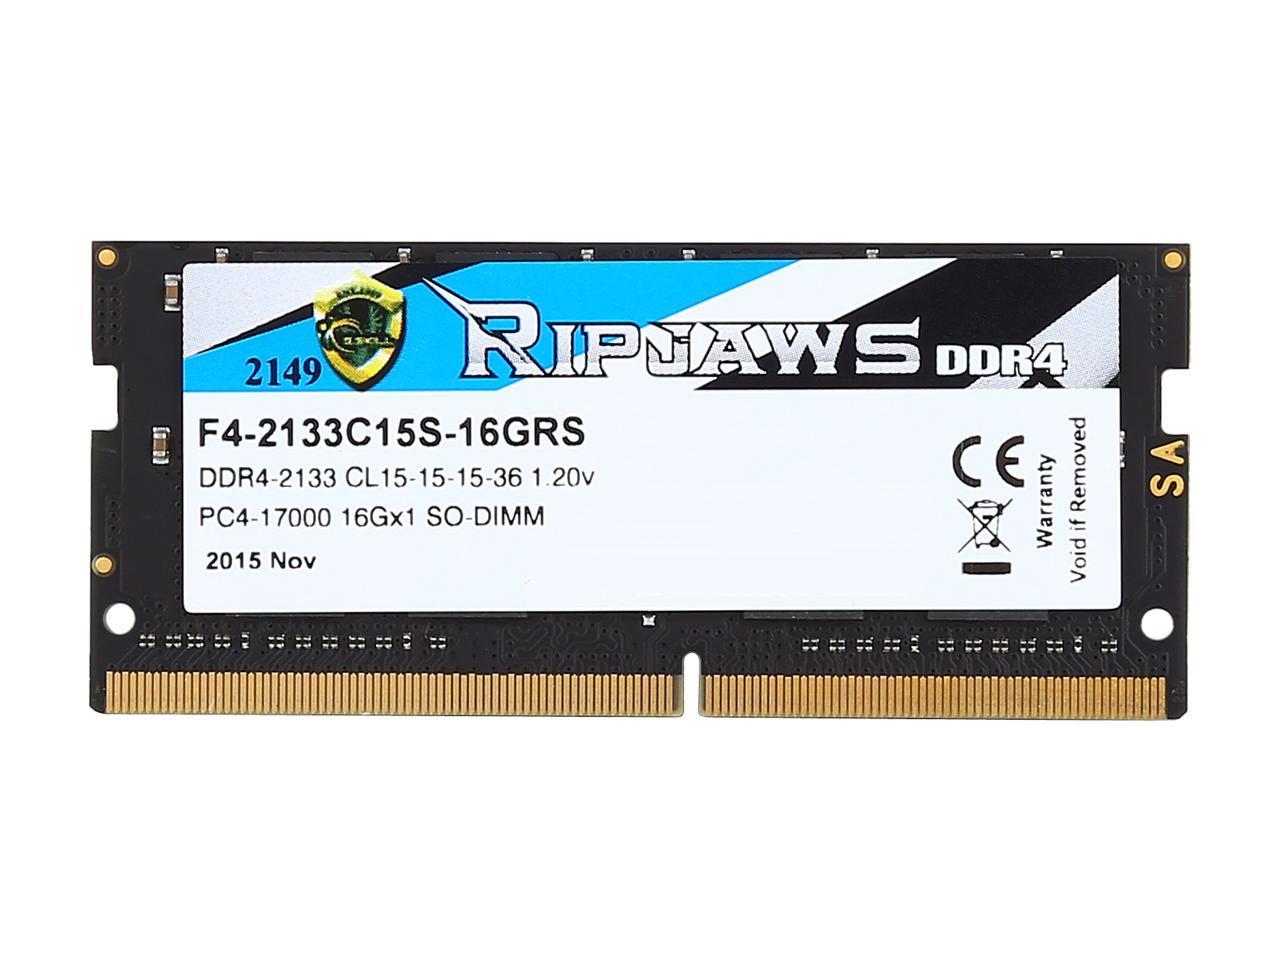 G.SKILL Ripjaws Series 16GB 260-Pin DDR4 SO-DIMM DDR4 2133 Laptop Me PC4 17000